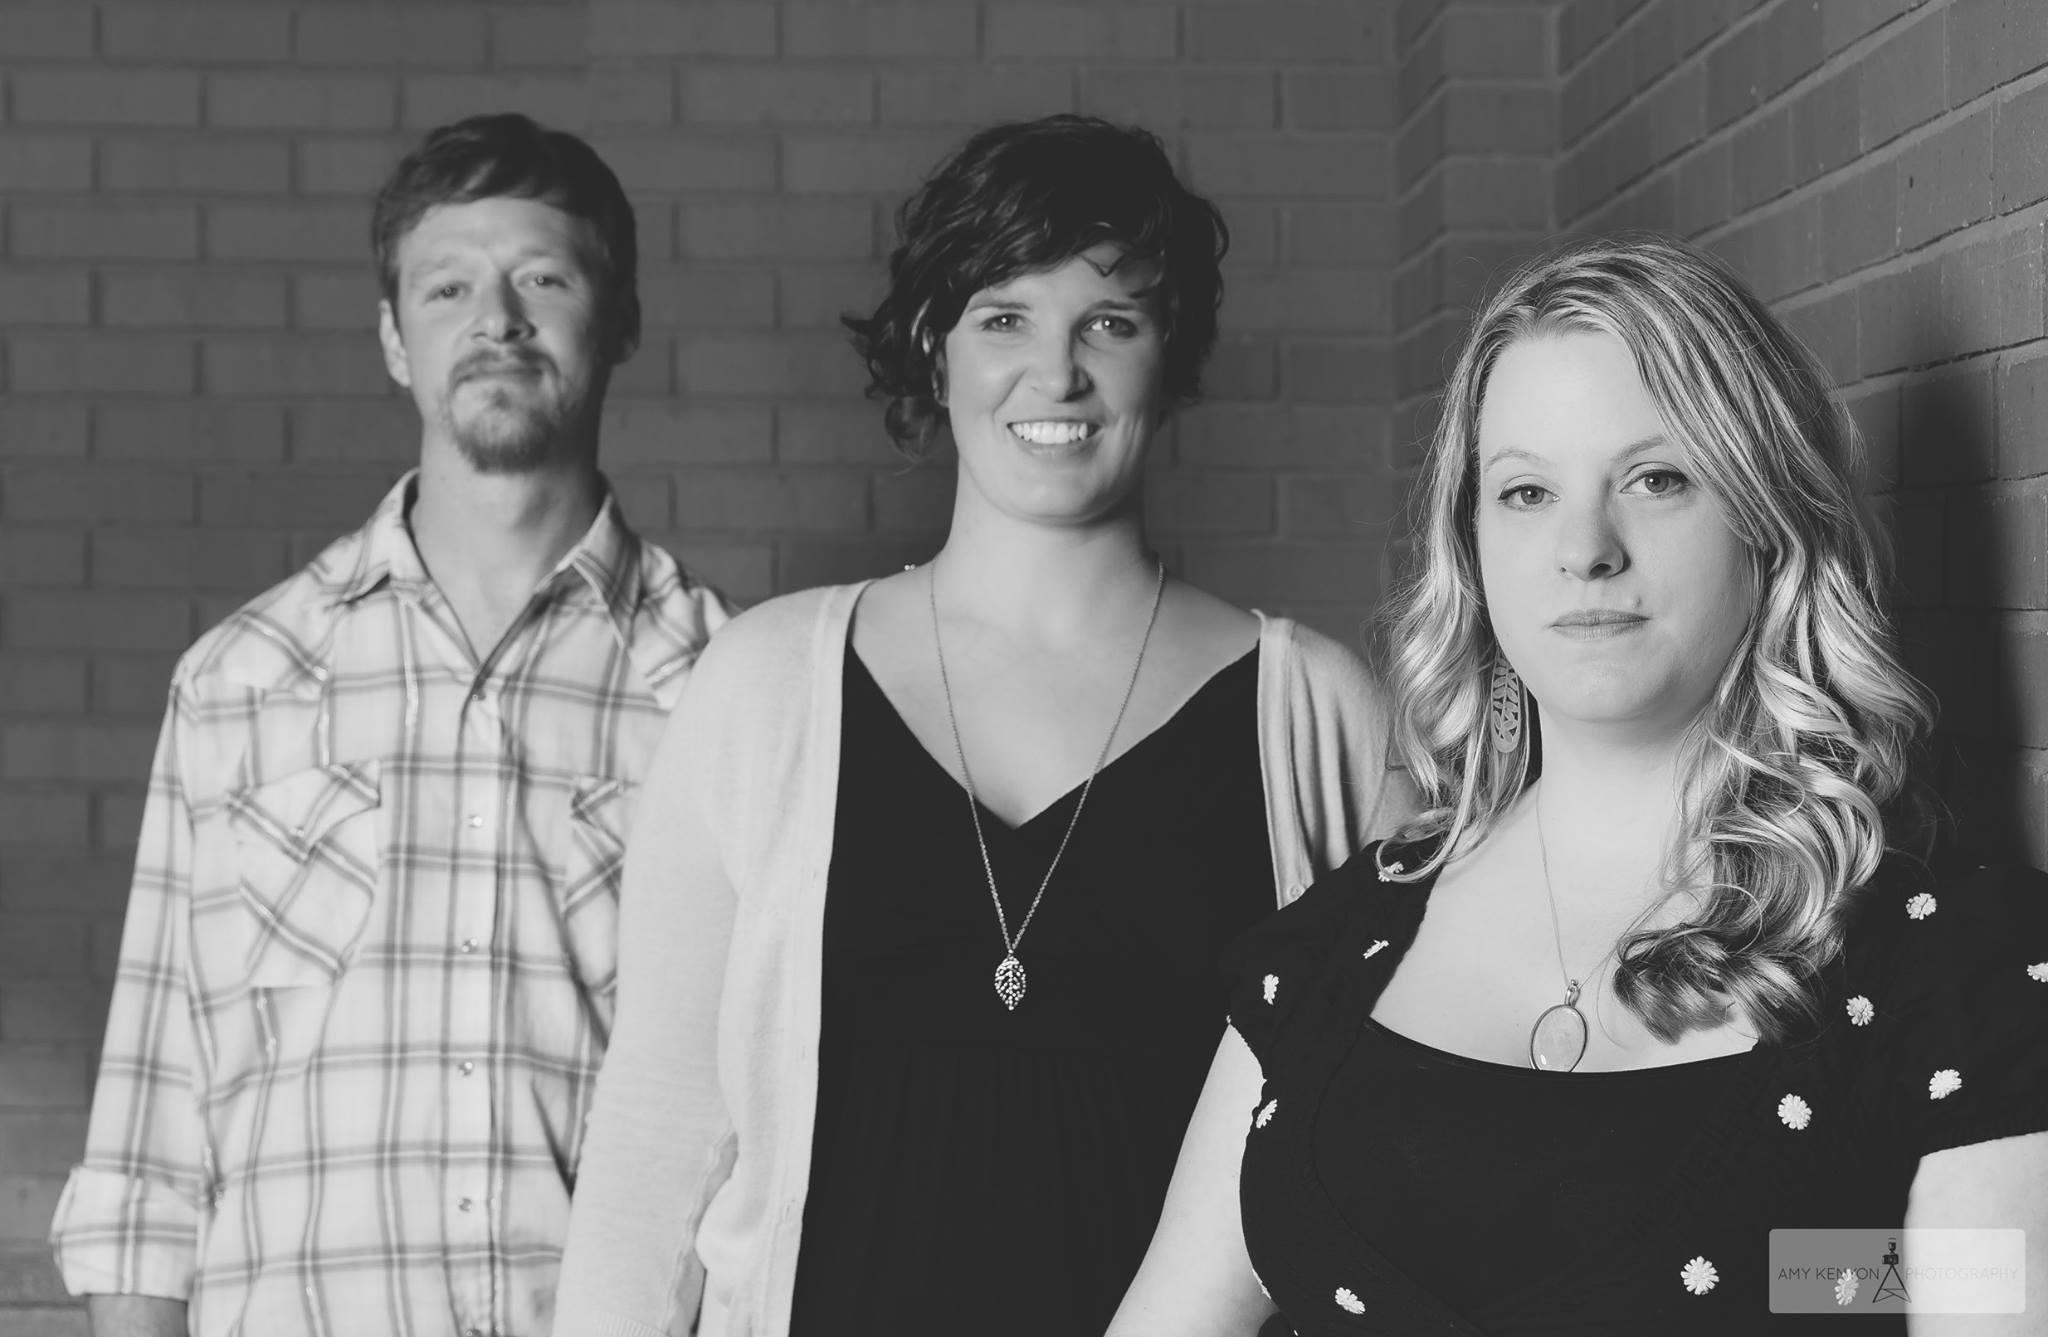 Megan Saunders and The Driftless — January 9, 2016 — Red Light Café, Atlanta, GA